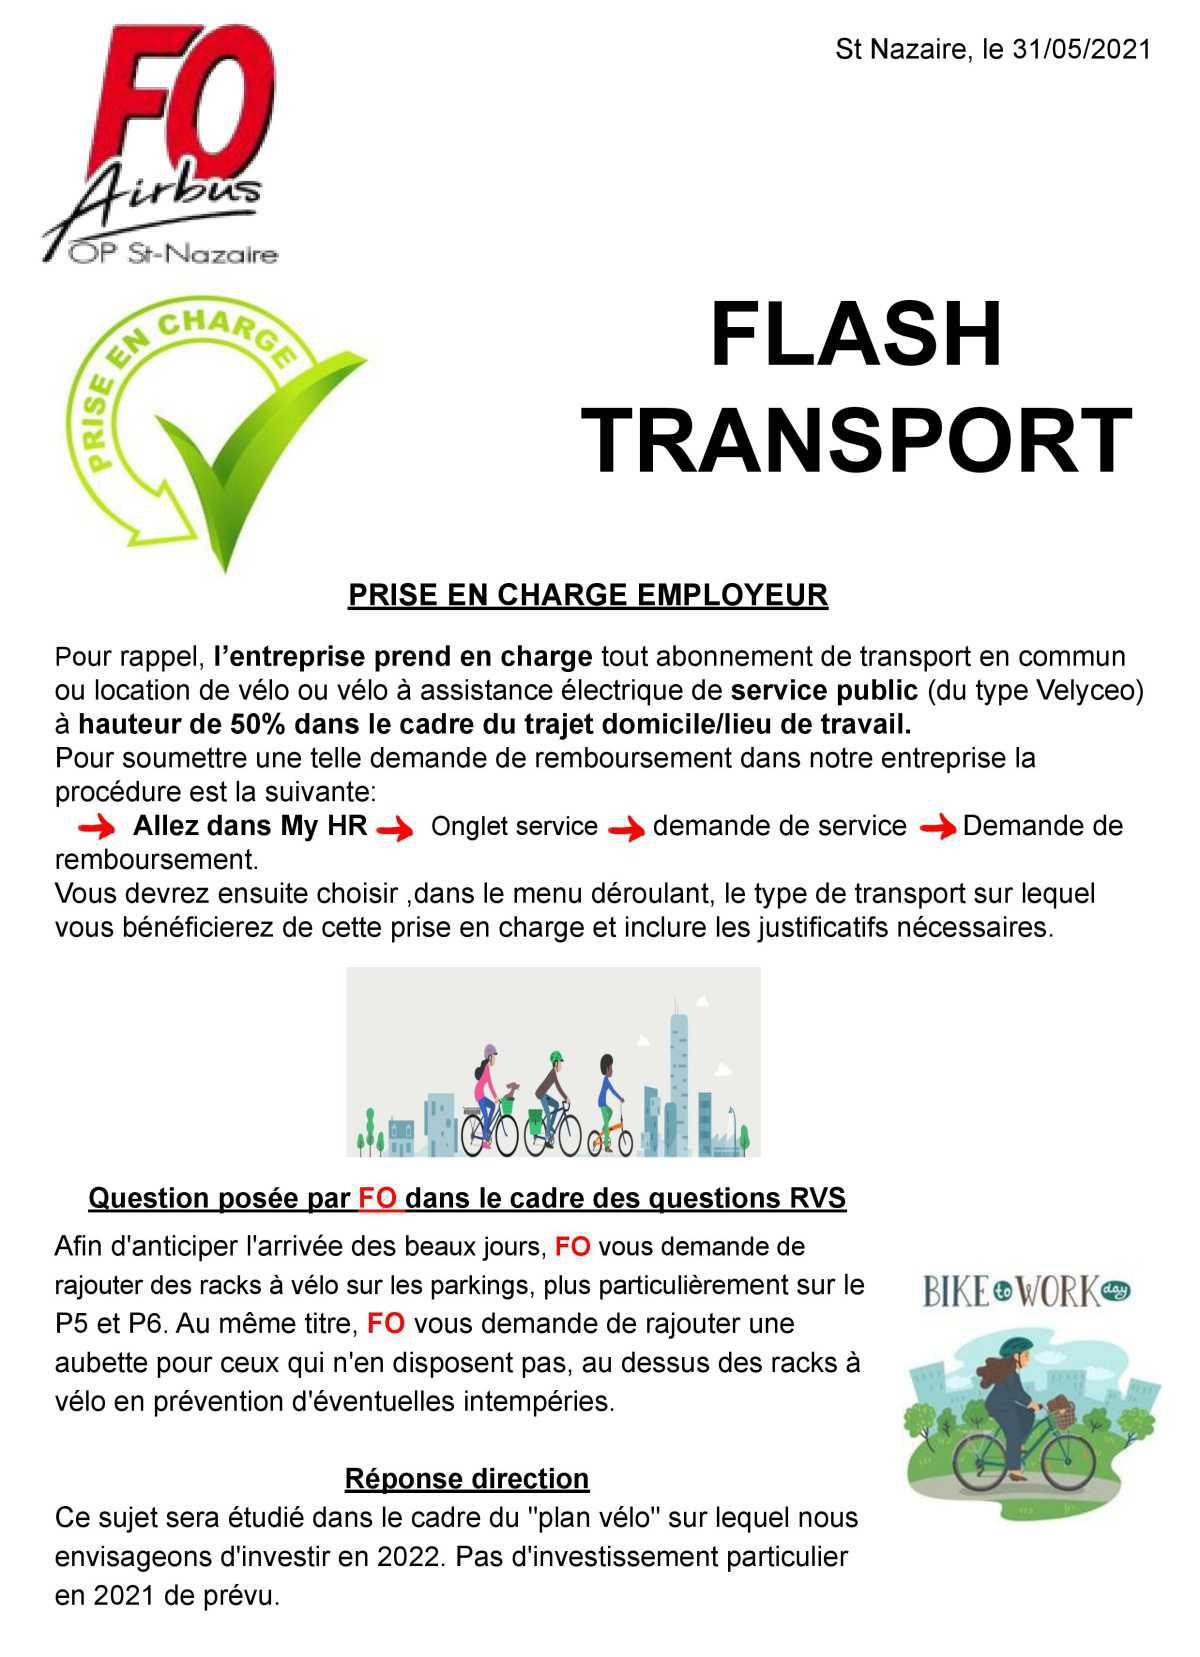 Flash Transport : Prise en charge employeur